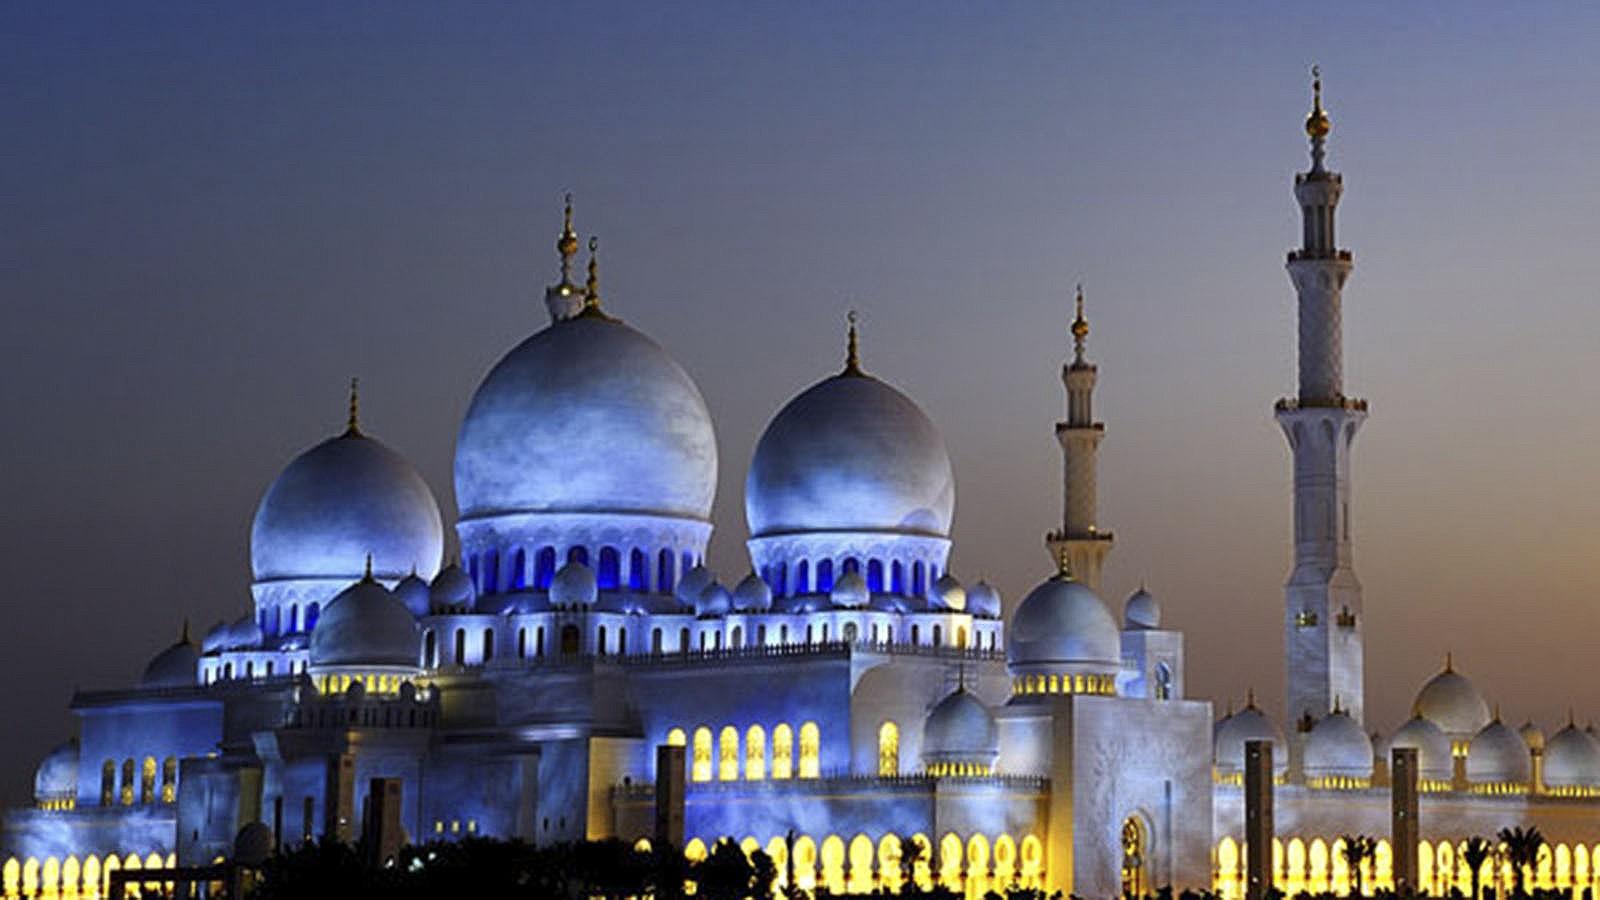 Sights of Abu Dhabi: what is definitely worth seeing 97